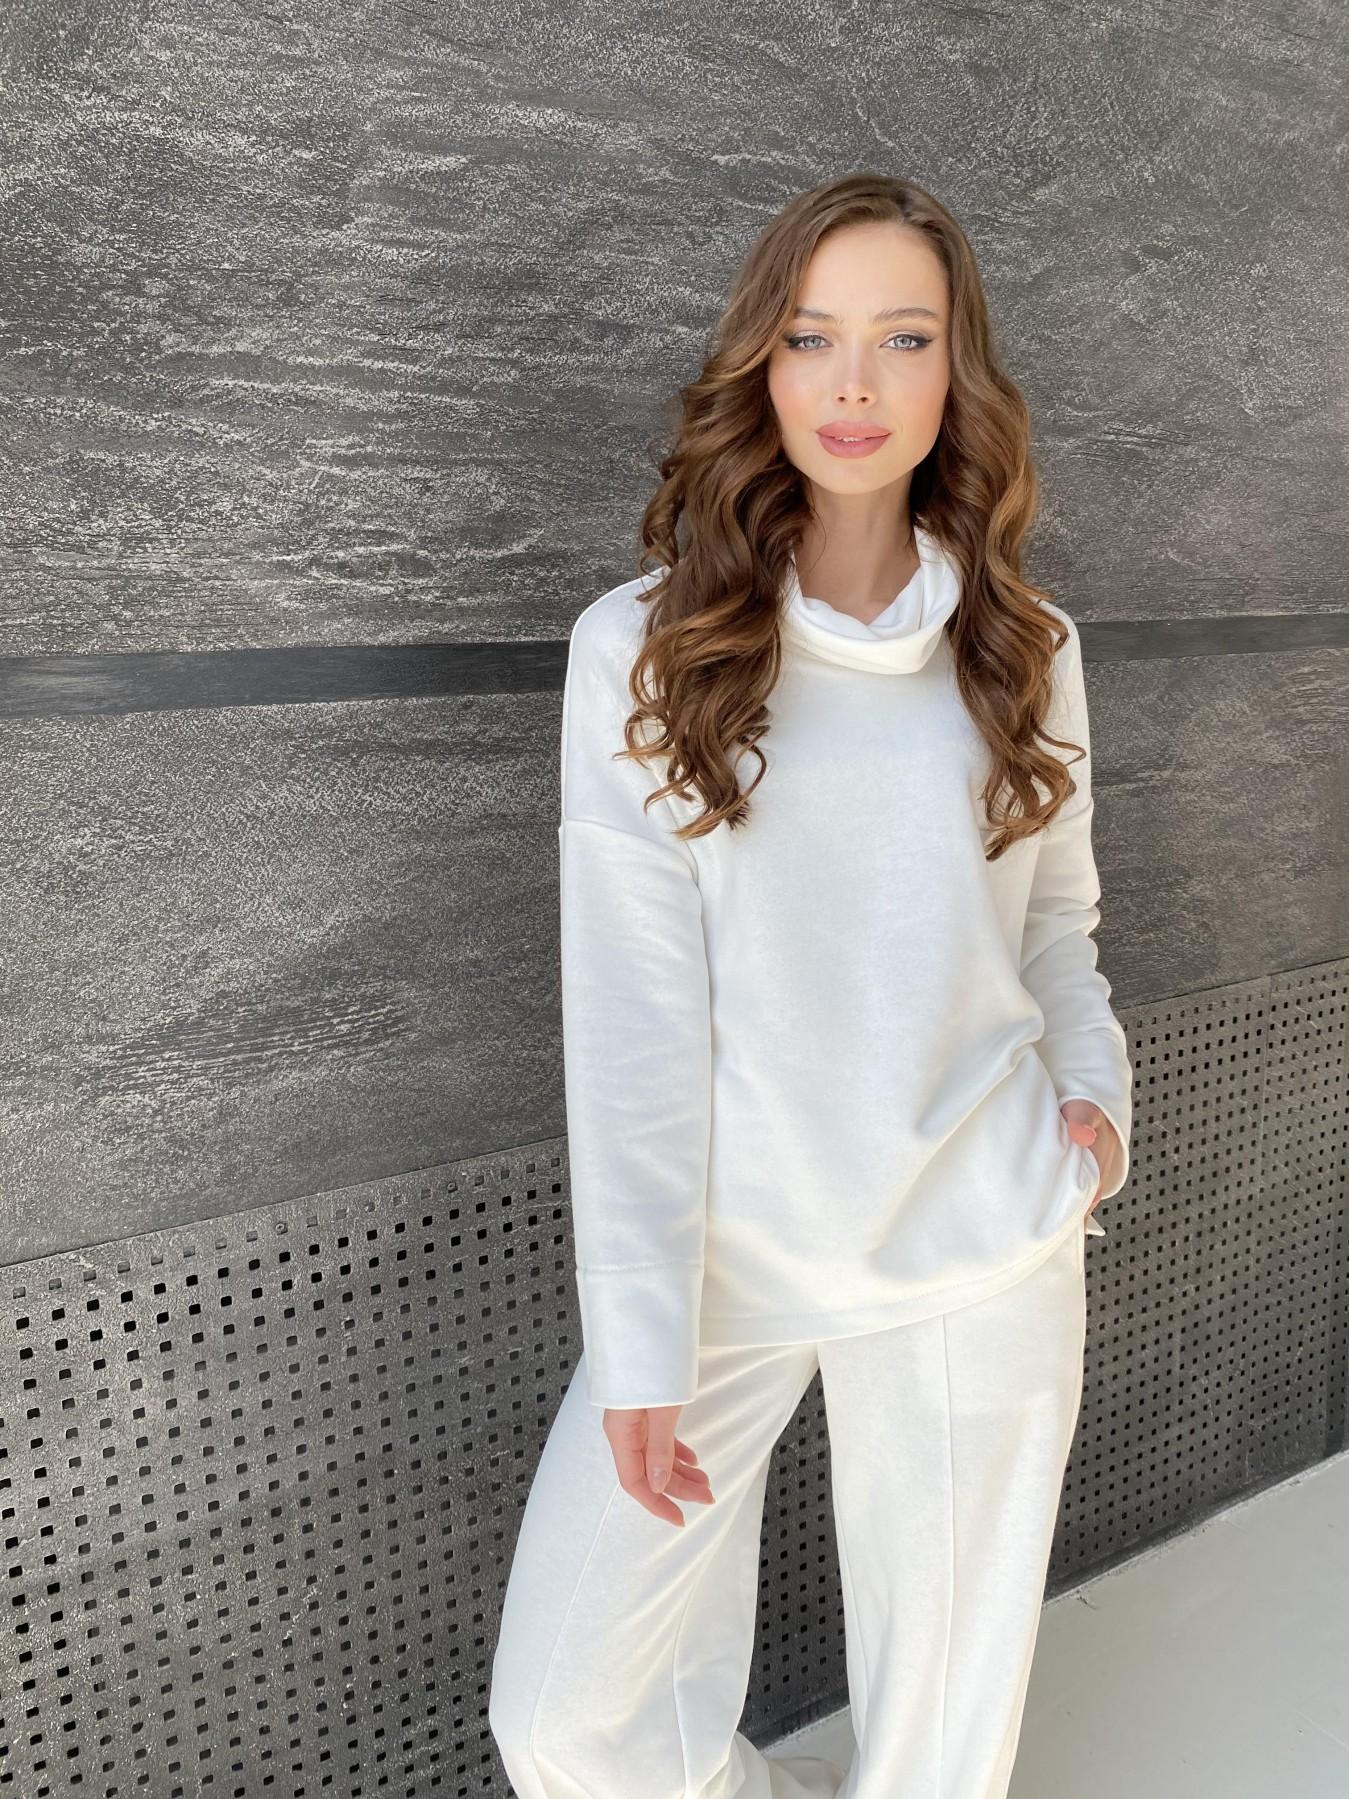 Джаст костюм Oversize  3х нитка 10564 АРТ. 47240 Цвет: Молоко - фото 5, интернет магазин tm-modus.ru